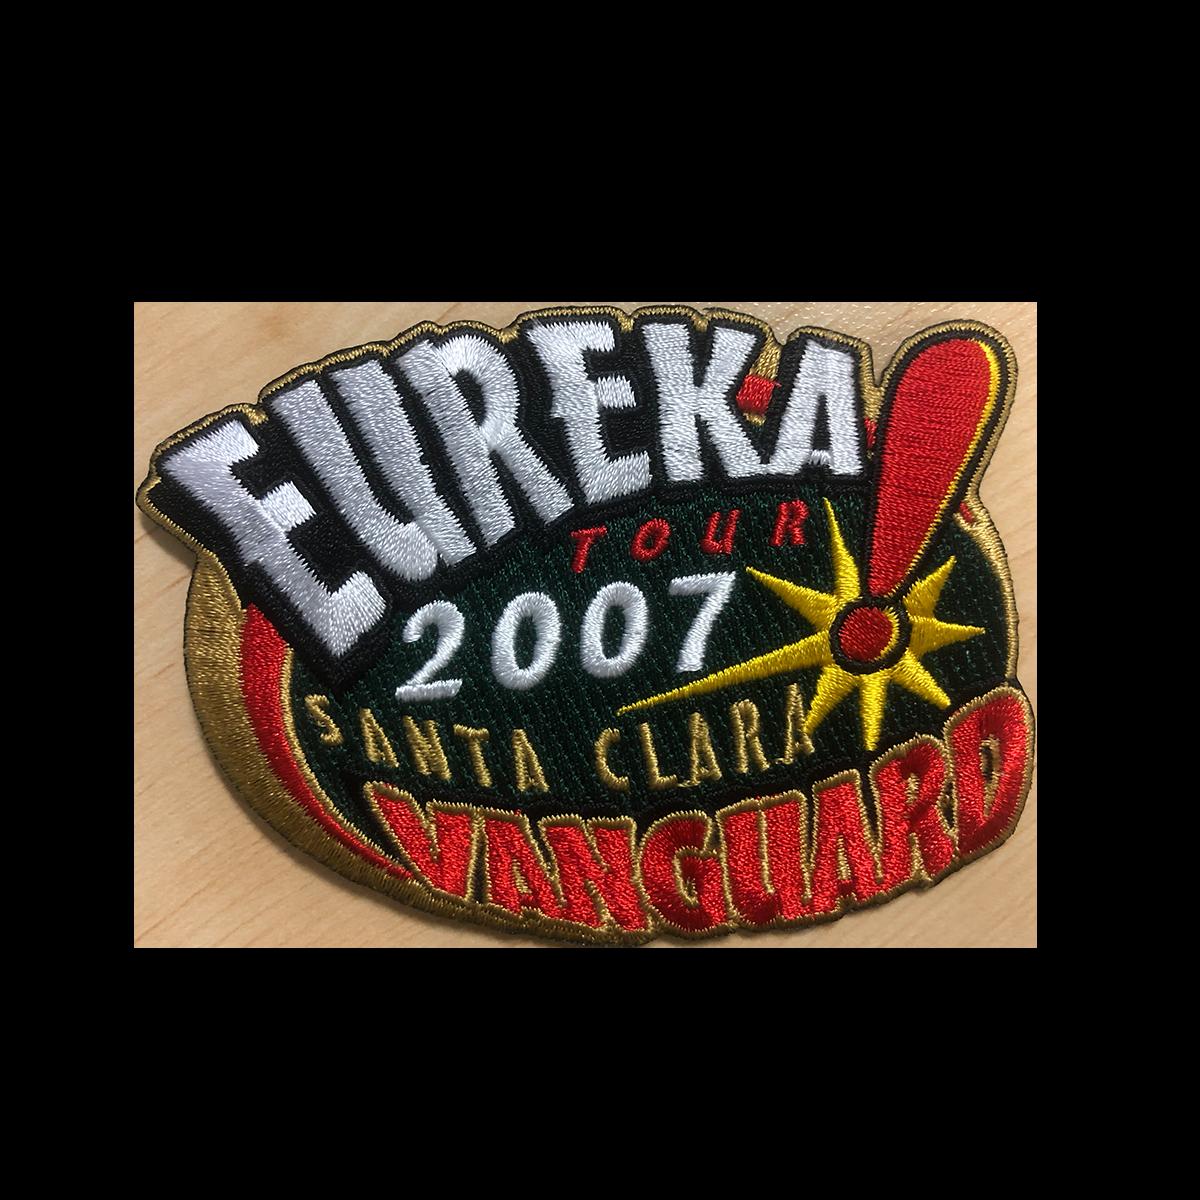 2007 Eureka Tour Patch